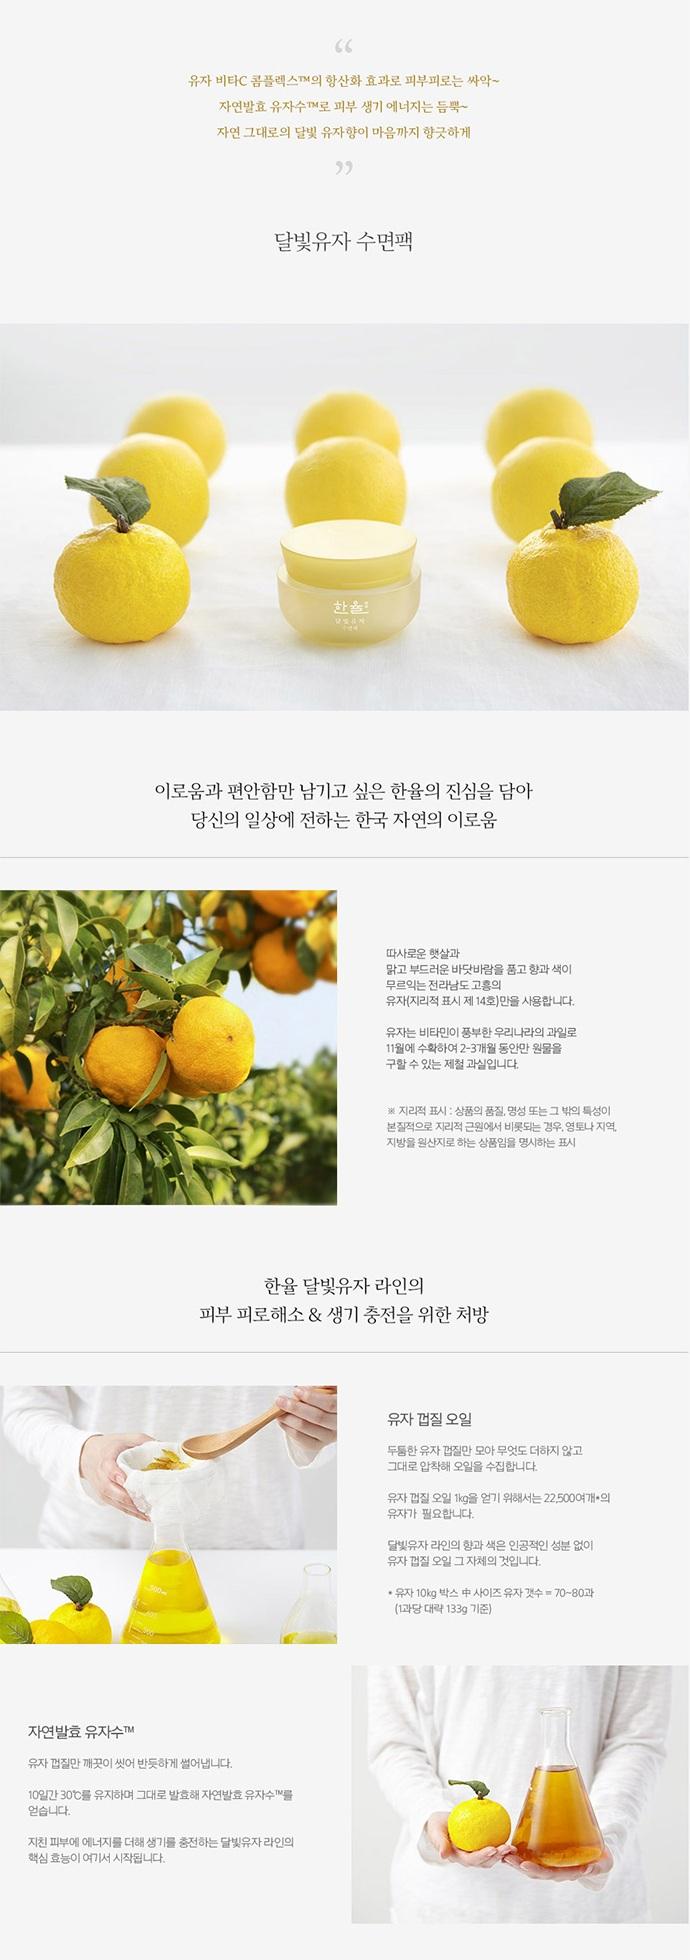 HanYul Moonlight Citron Sleeping Mask korean cosmetic skincare product online shop malaysia mexico argentina1